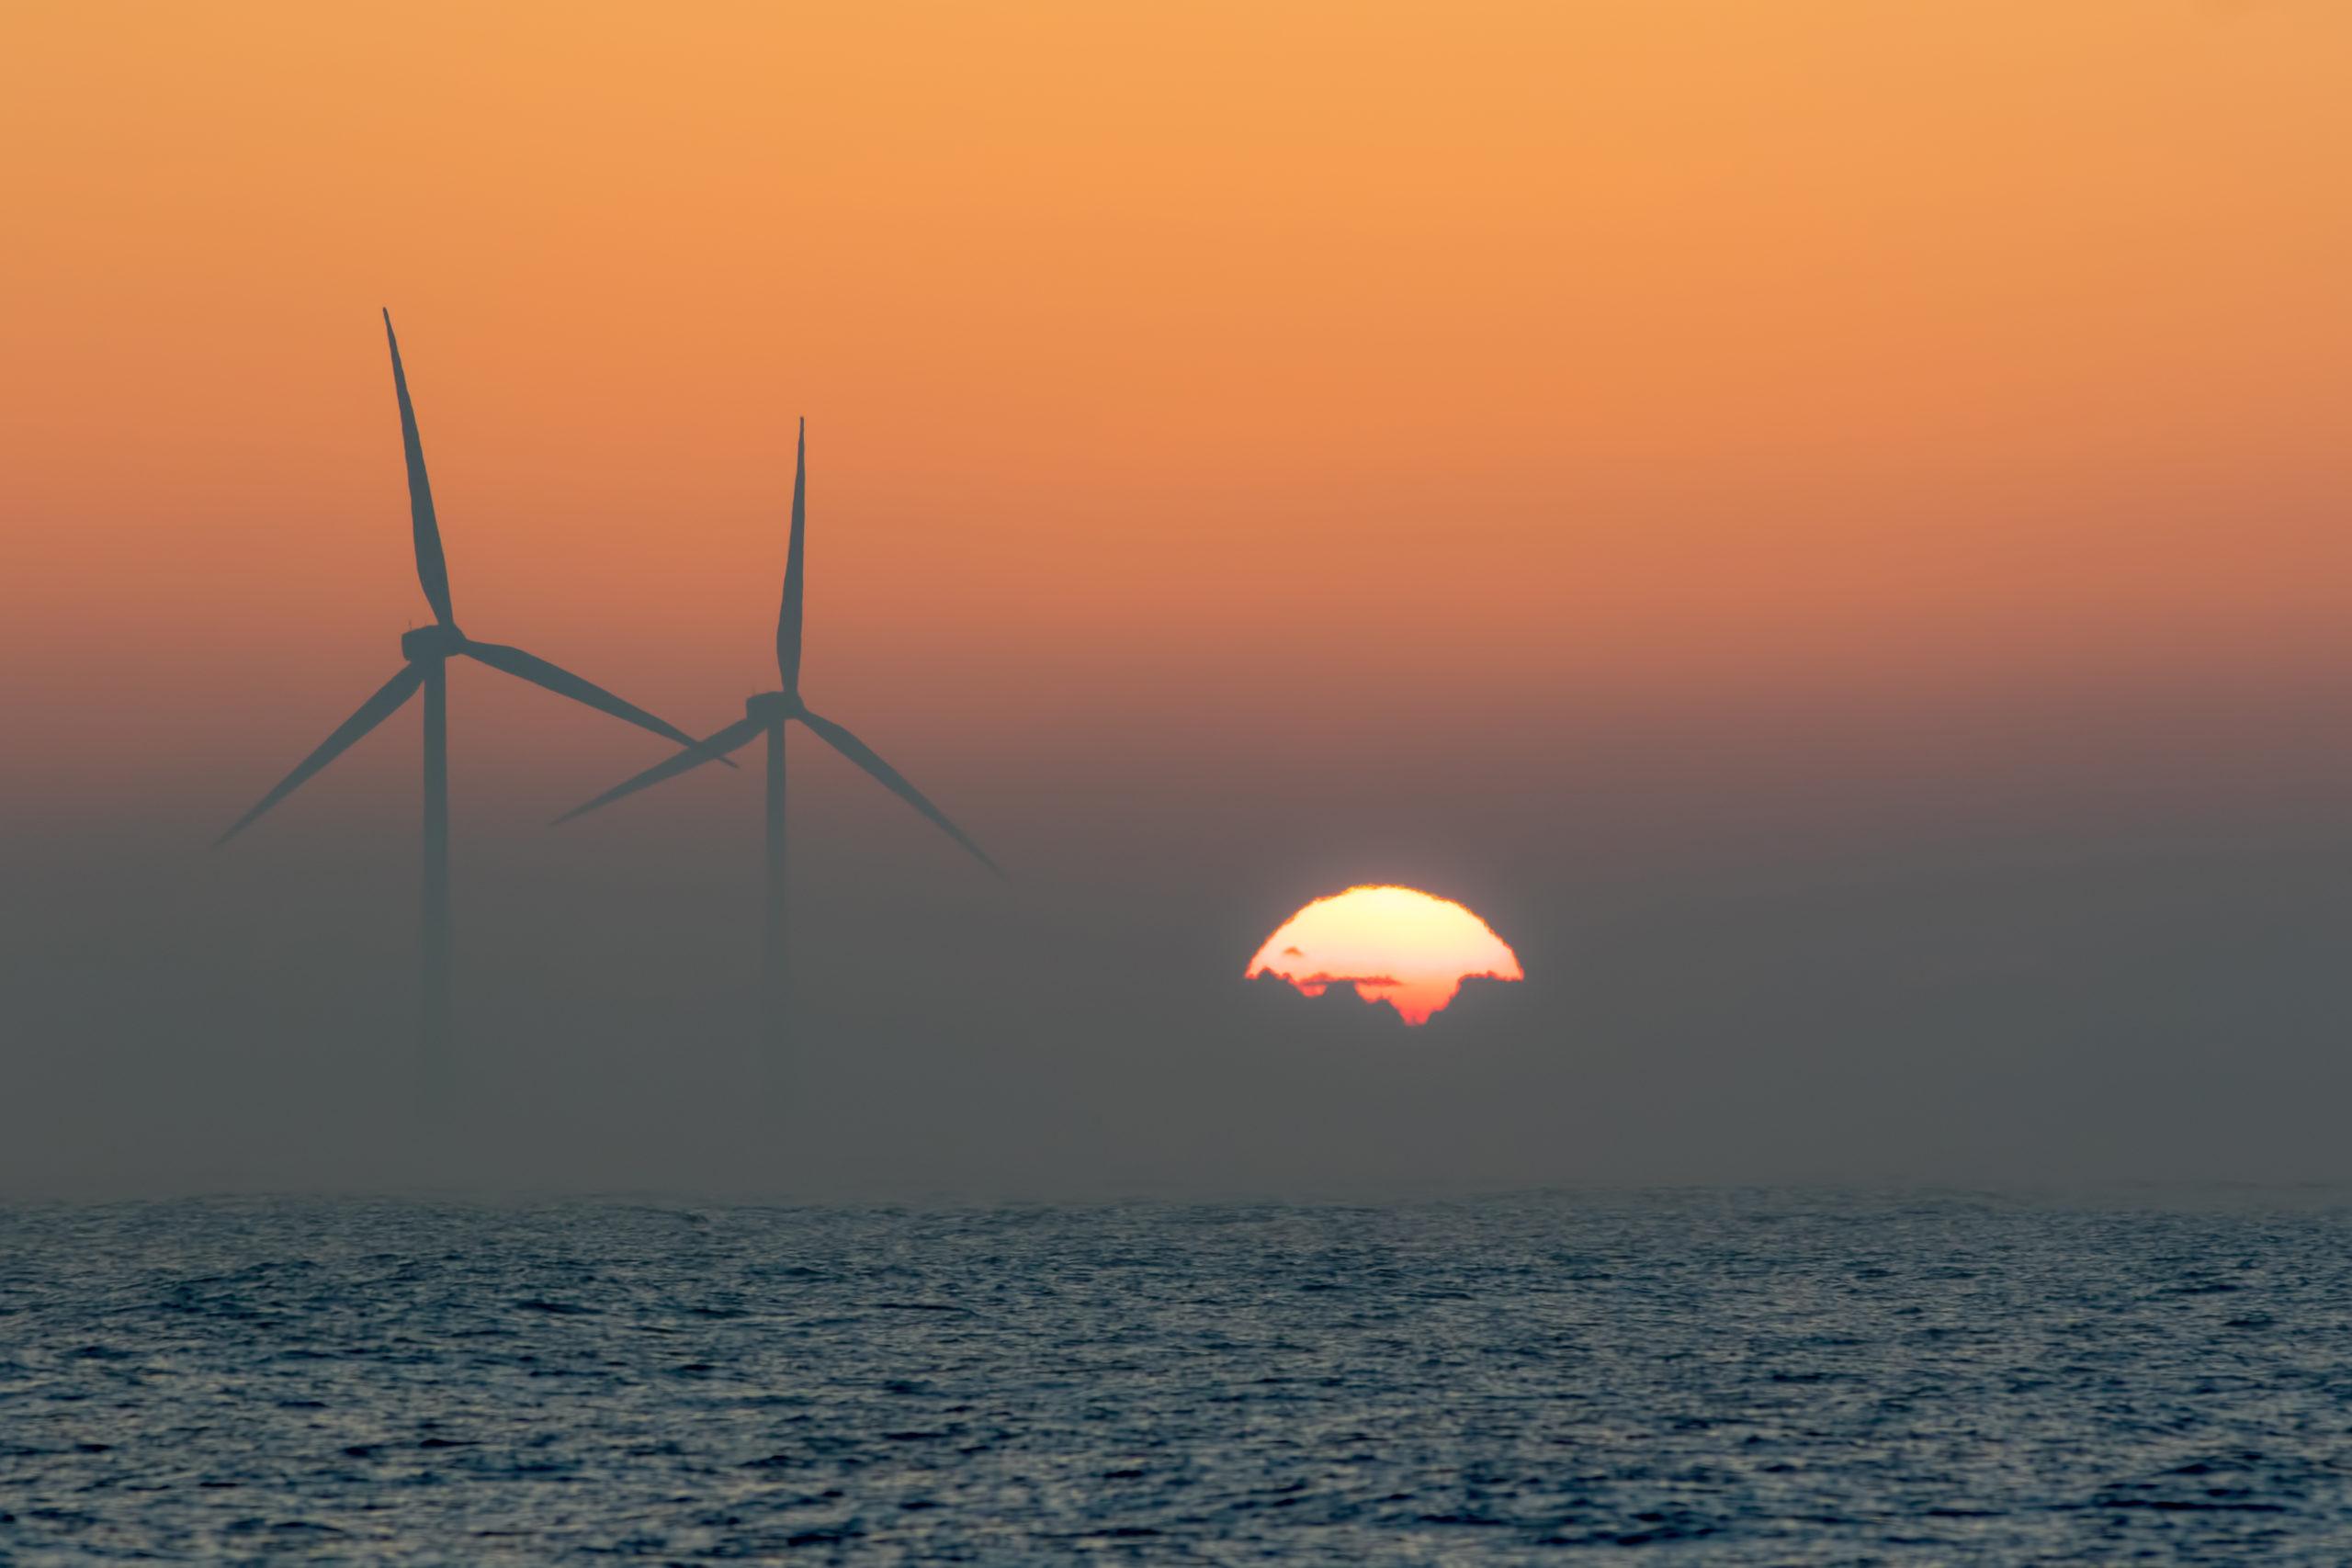 offshore wind turbines, renewable, sunset, energy